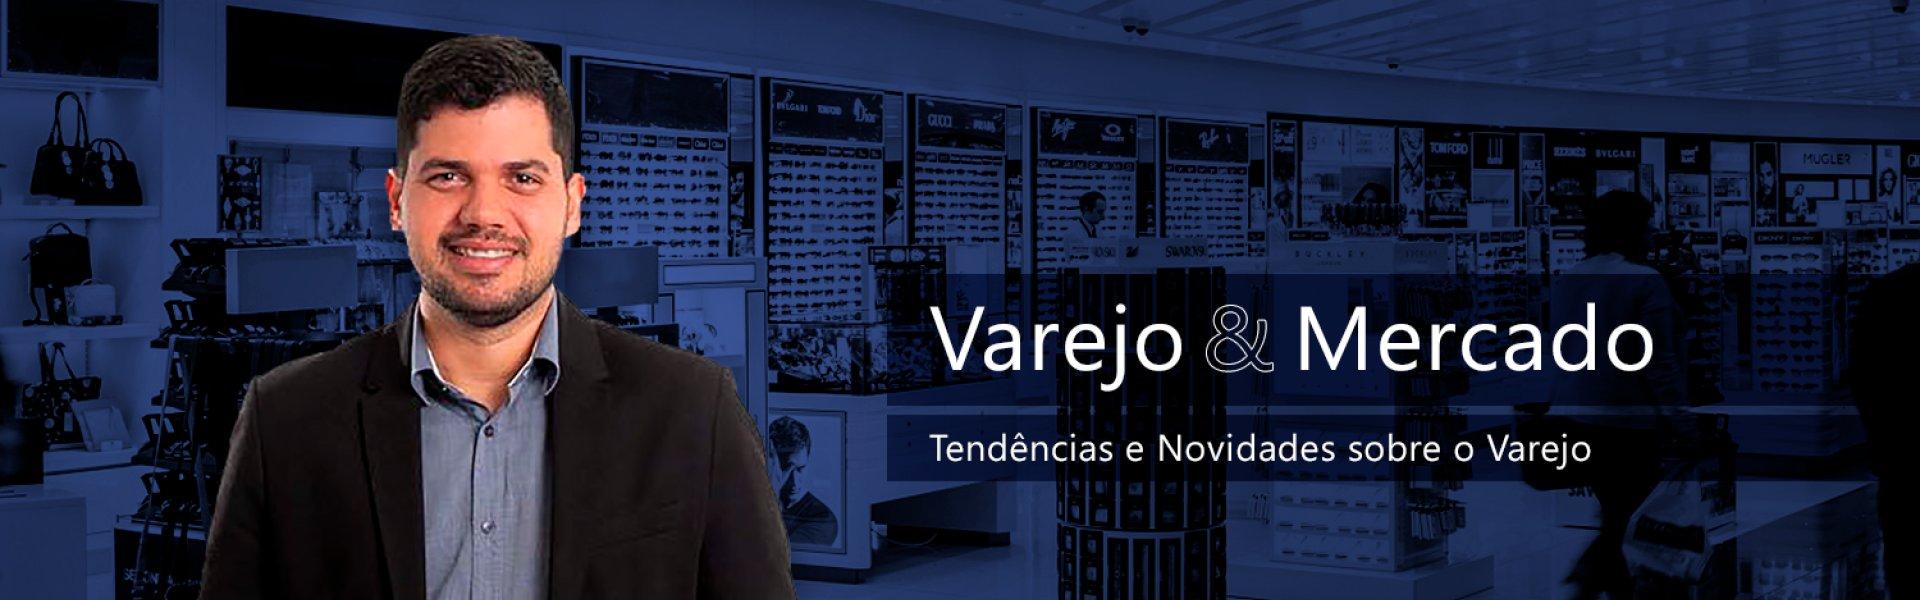 Varejo & Mercado